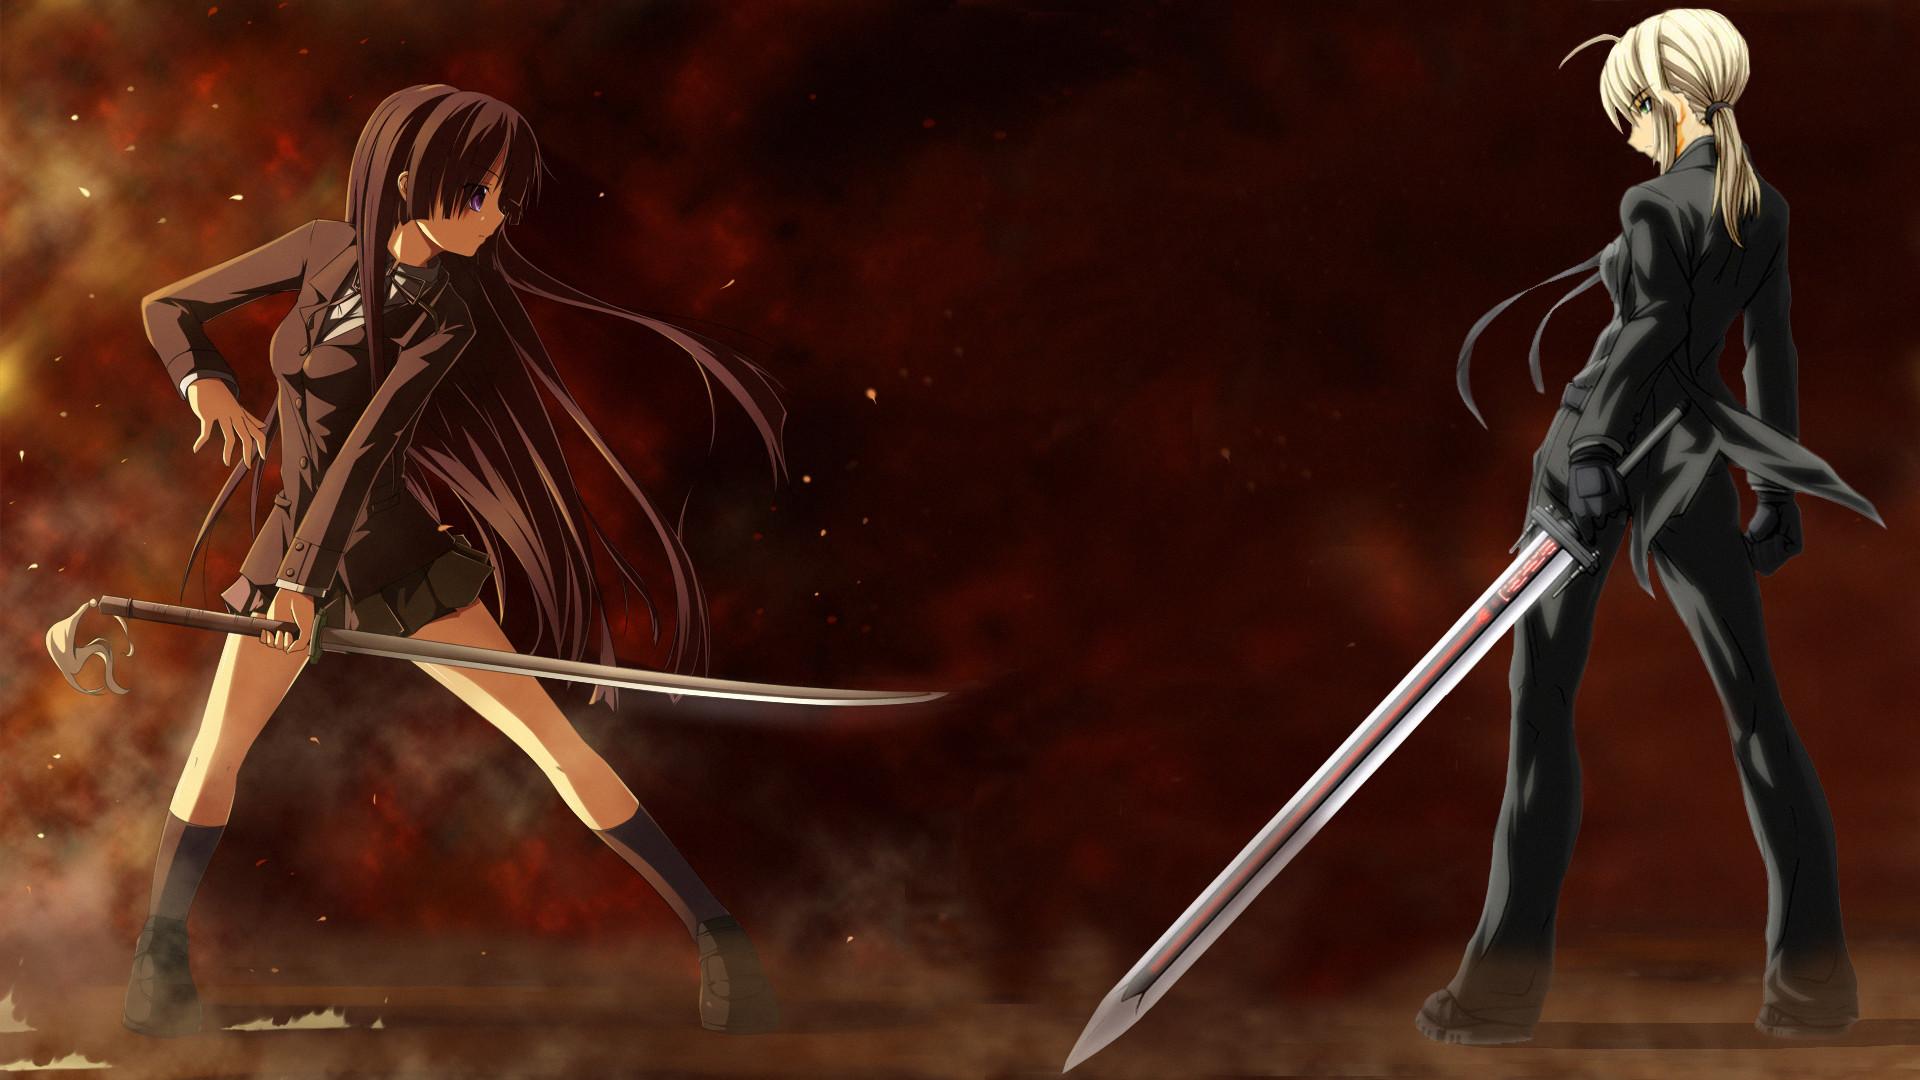 Anime – Crossover Girl Sword Showdown Fate/Stay Night K-ON! Mio Akiyama